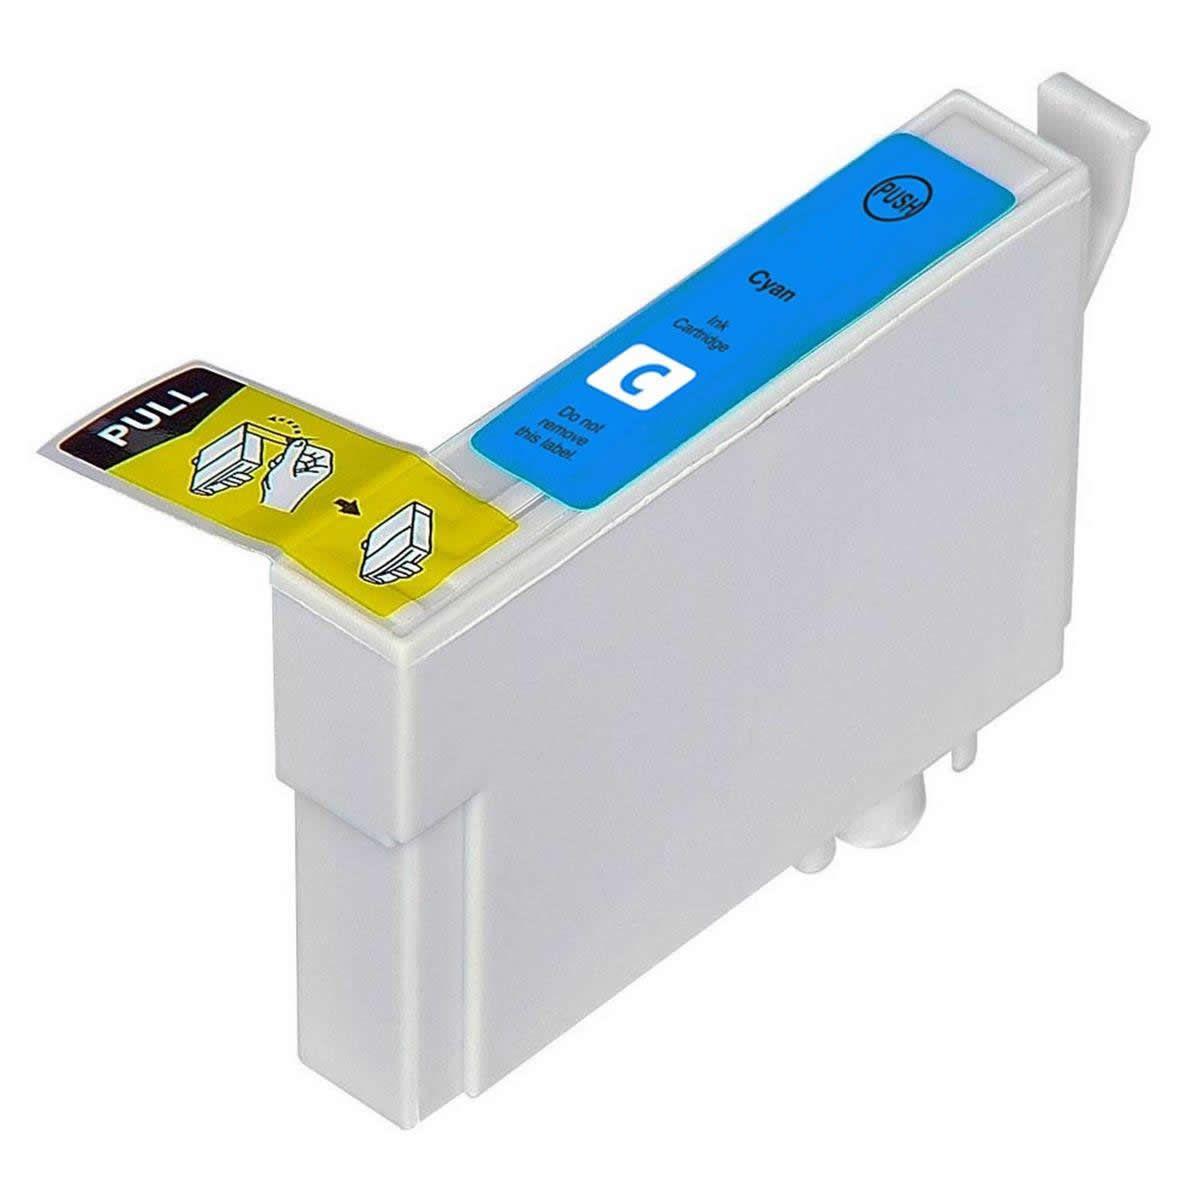 Cartucho TO482 Ciano Compatível para Epson R200 R220 R300 R320 R340 R500 R600 RX500 RX600 RX620 RX640